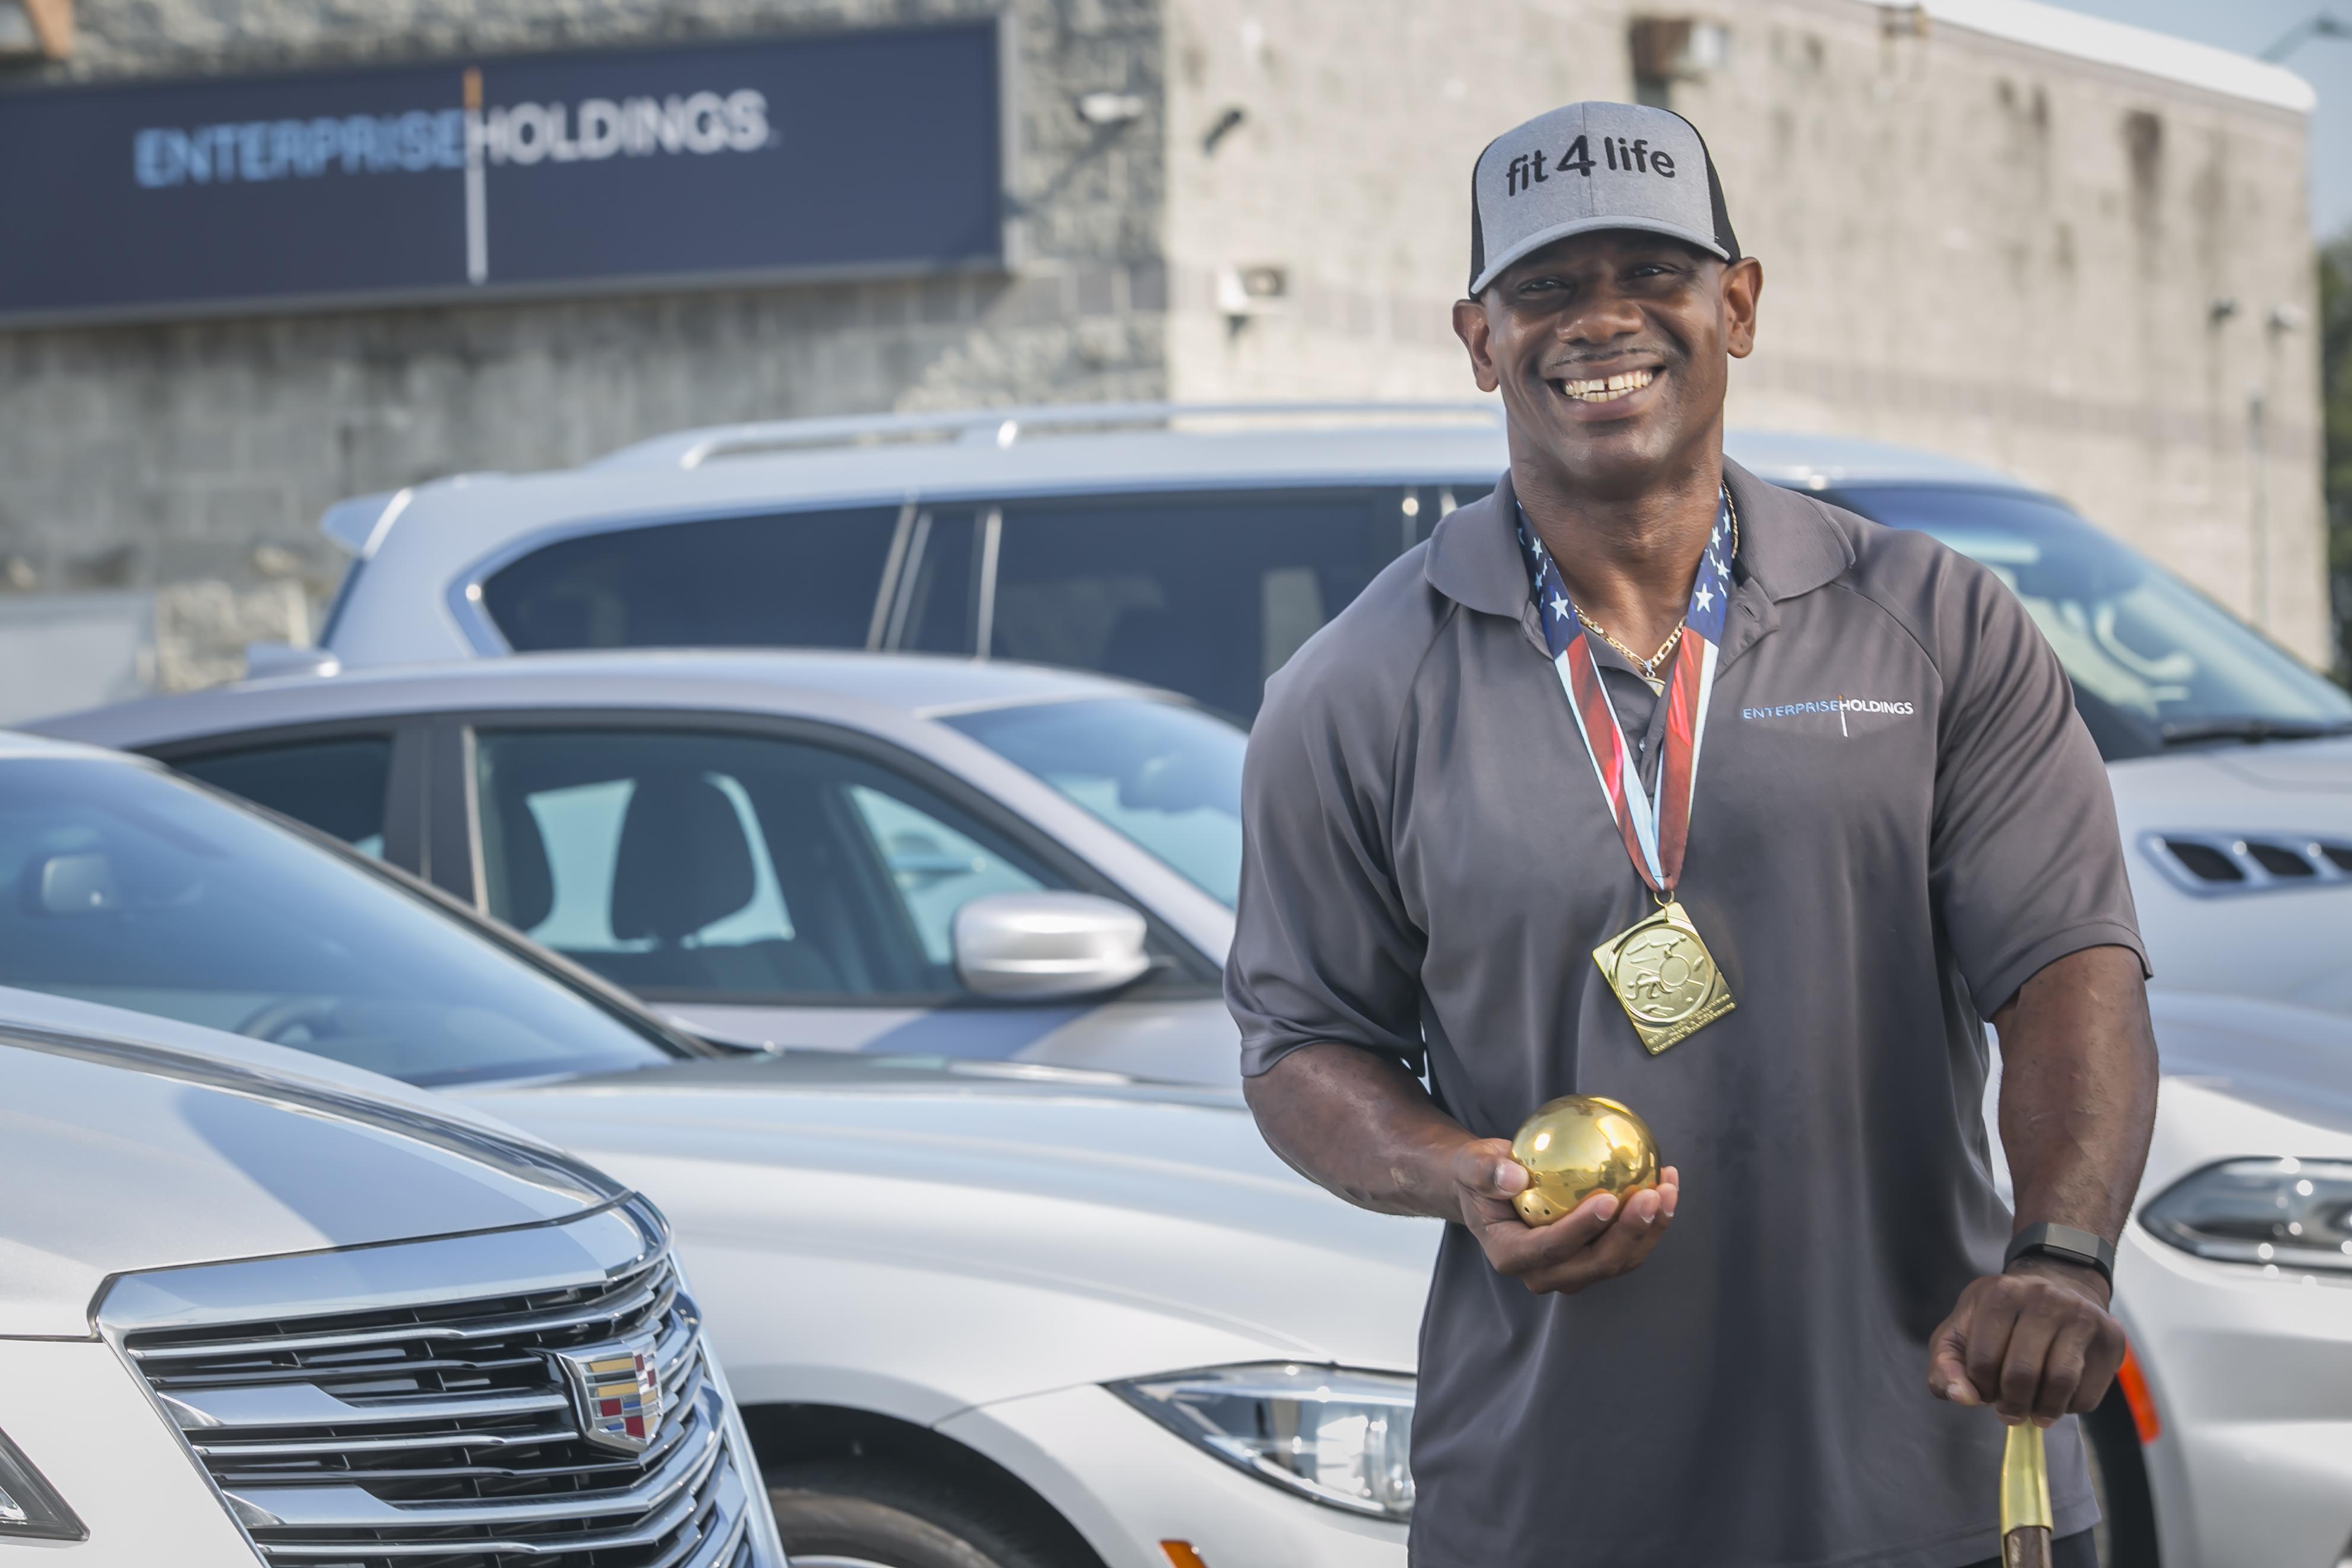 Savannah employee climbs world-rankings in shot put